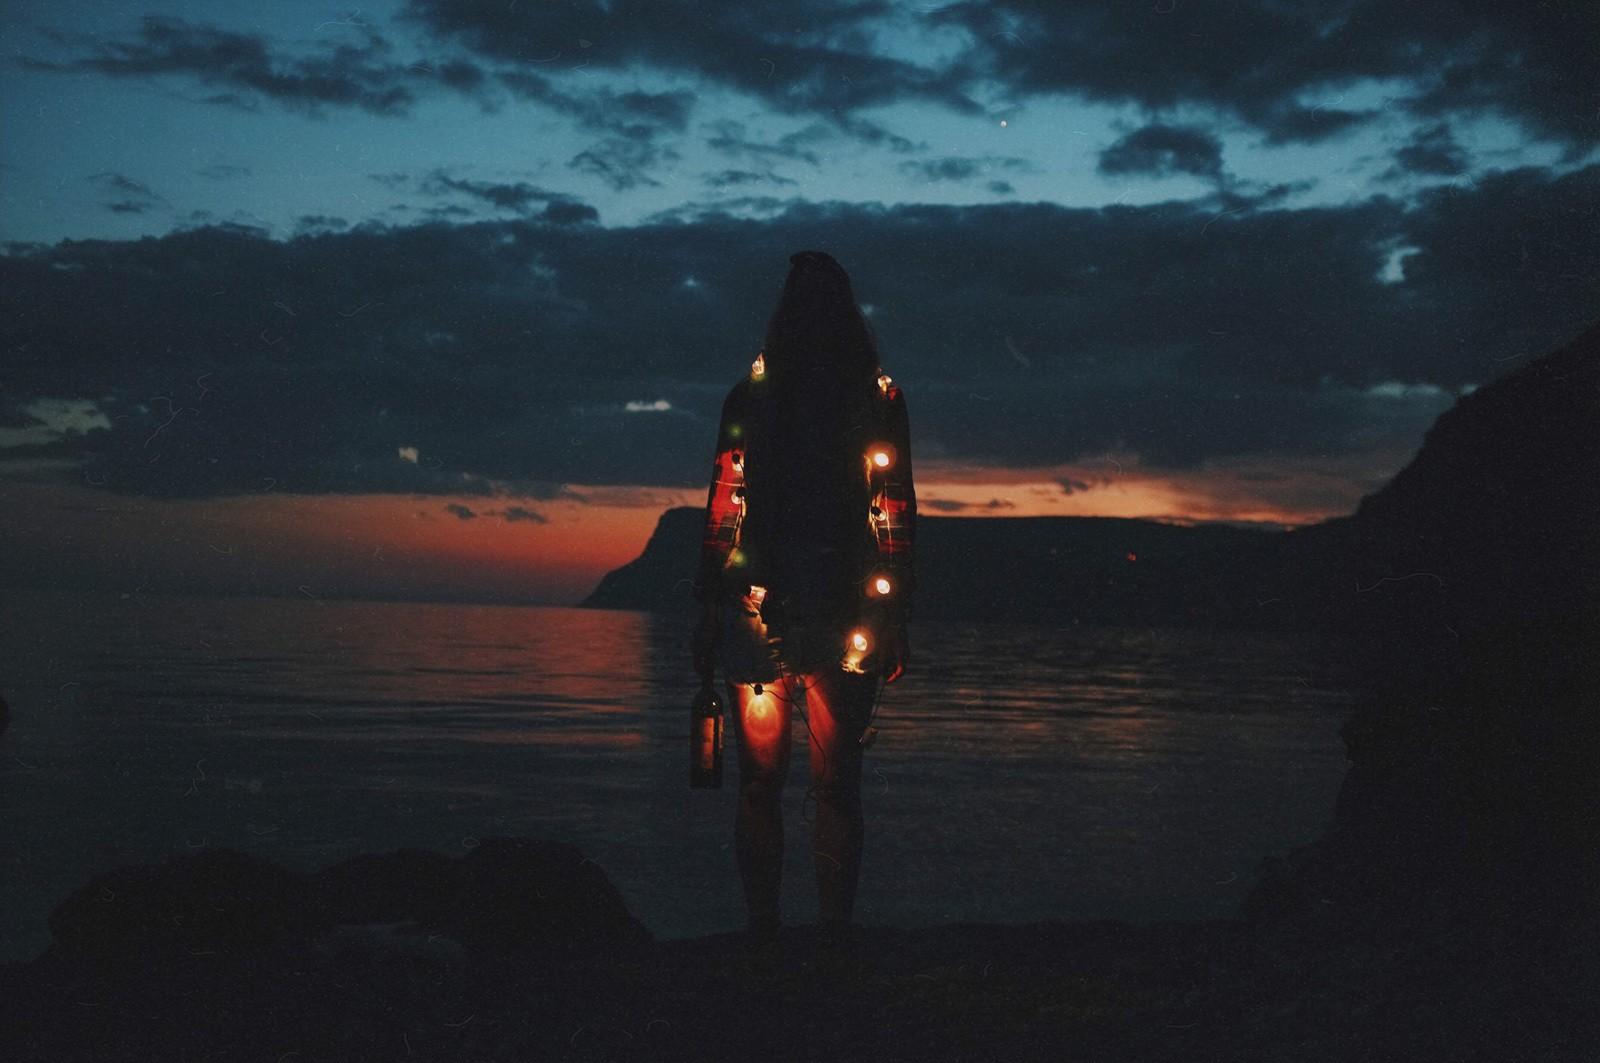 julia-karpacheva-paddleboarding-russia-black-sea-lights